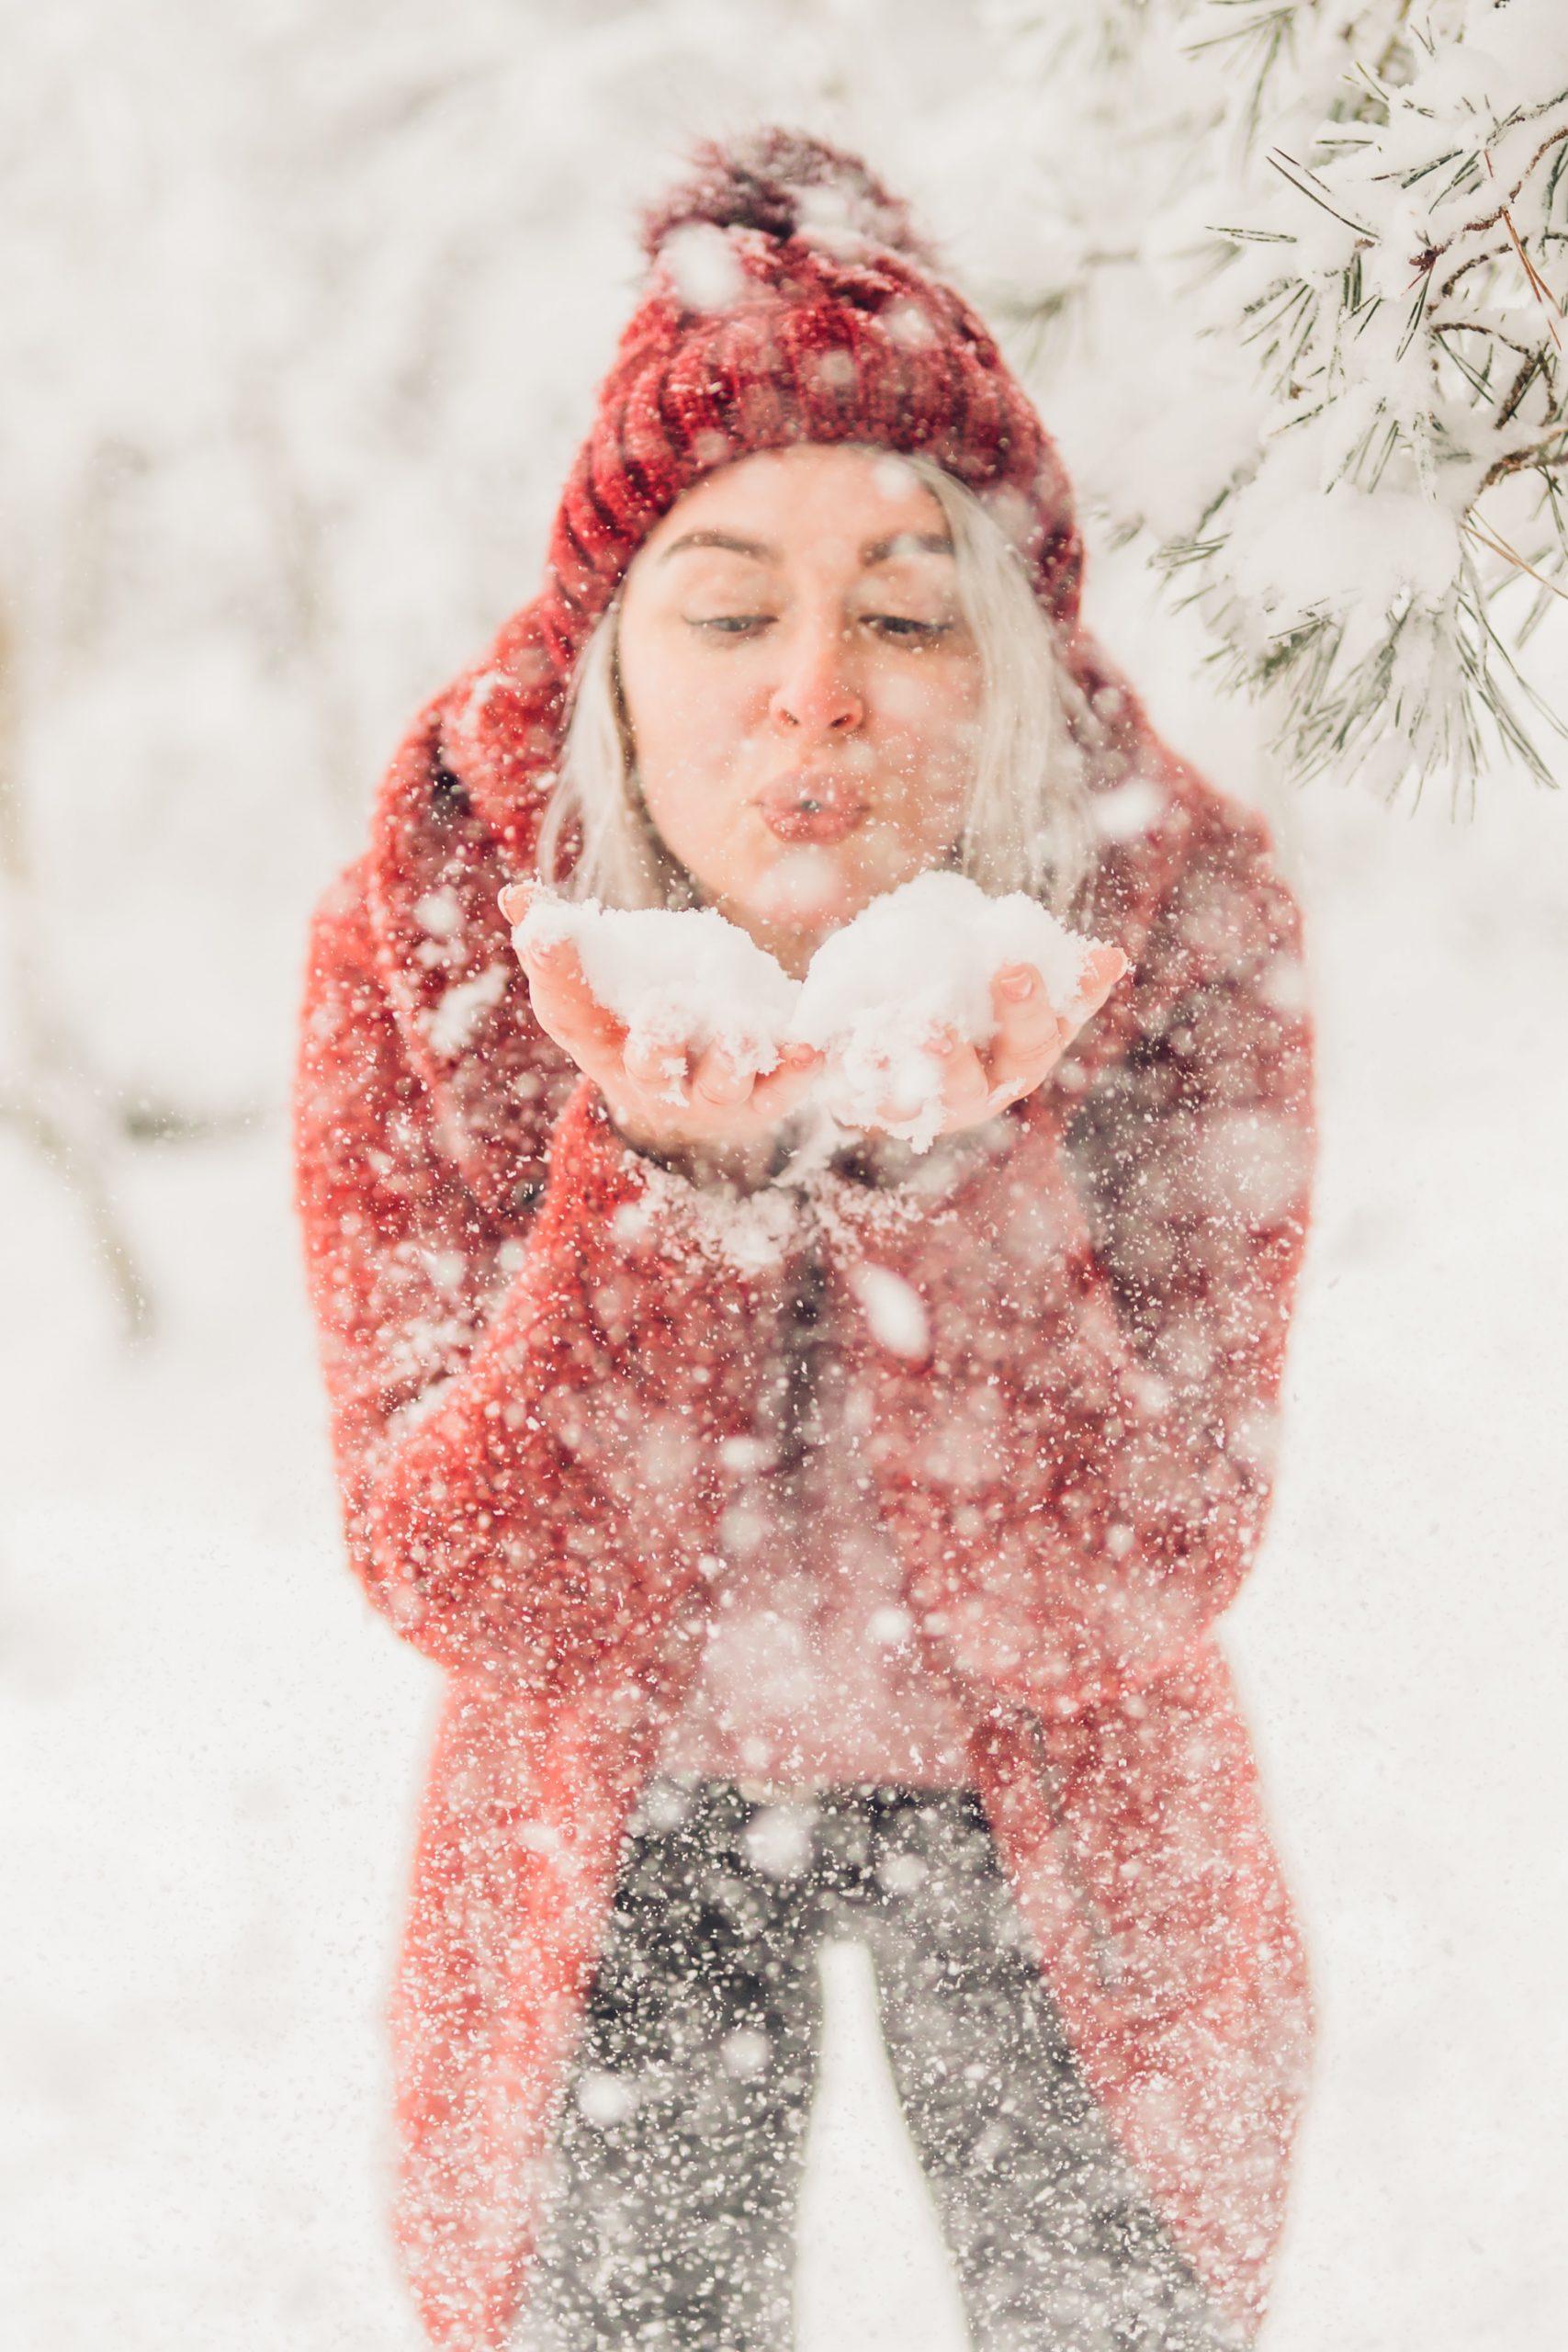 Wintershooting Portrait im Schnee